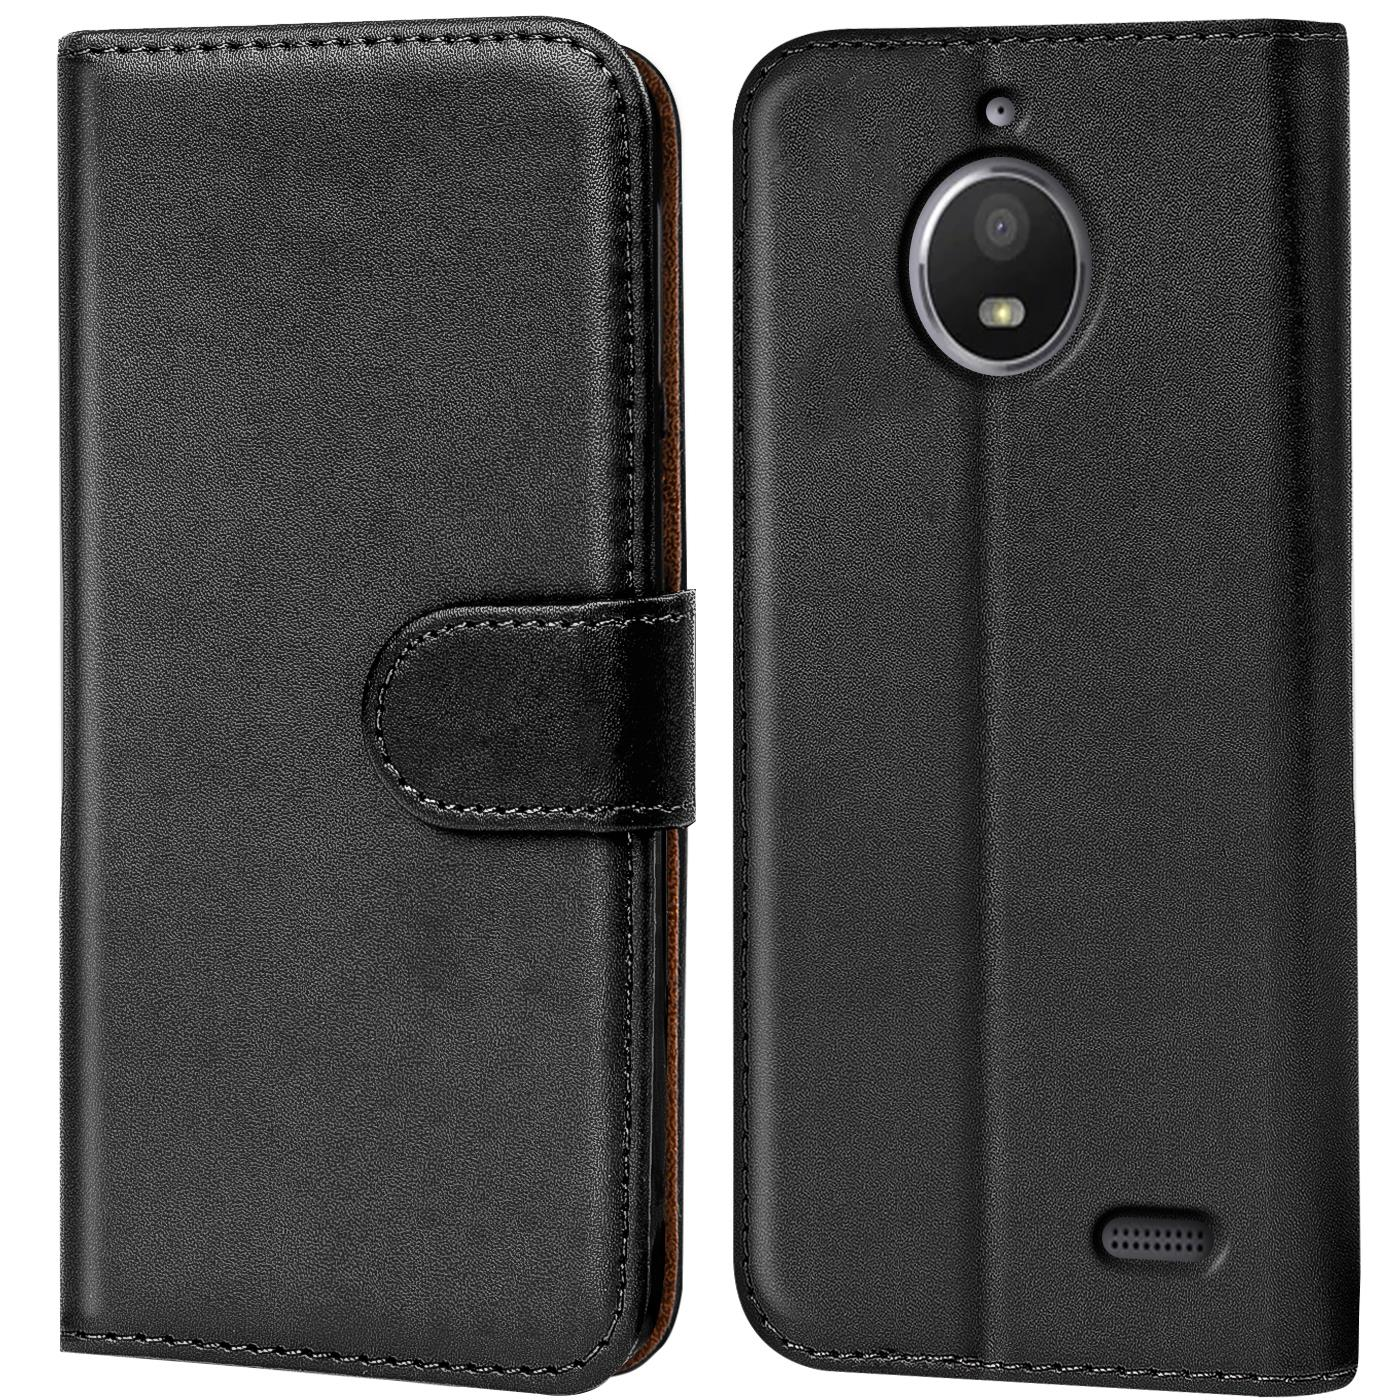 Flip Case Tasche Motorola Lenovo Handyhülle Handy Book Case Hülle Etui Bumper